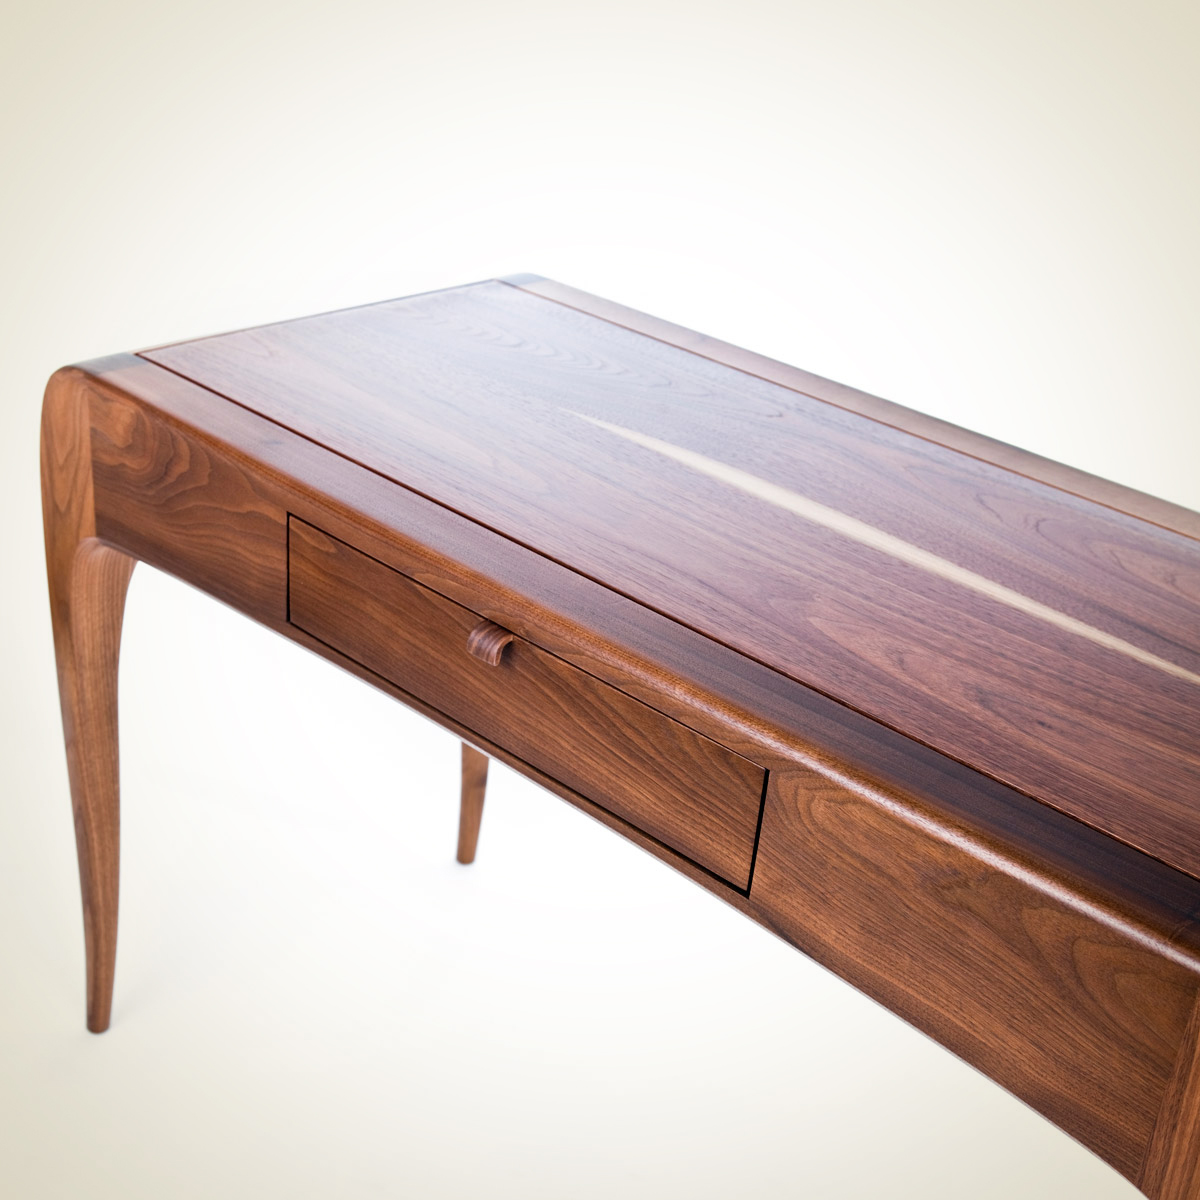 Caleb-Woodard-Hayworth-Desk_3.jpg